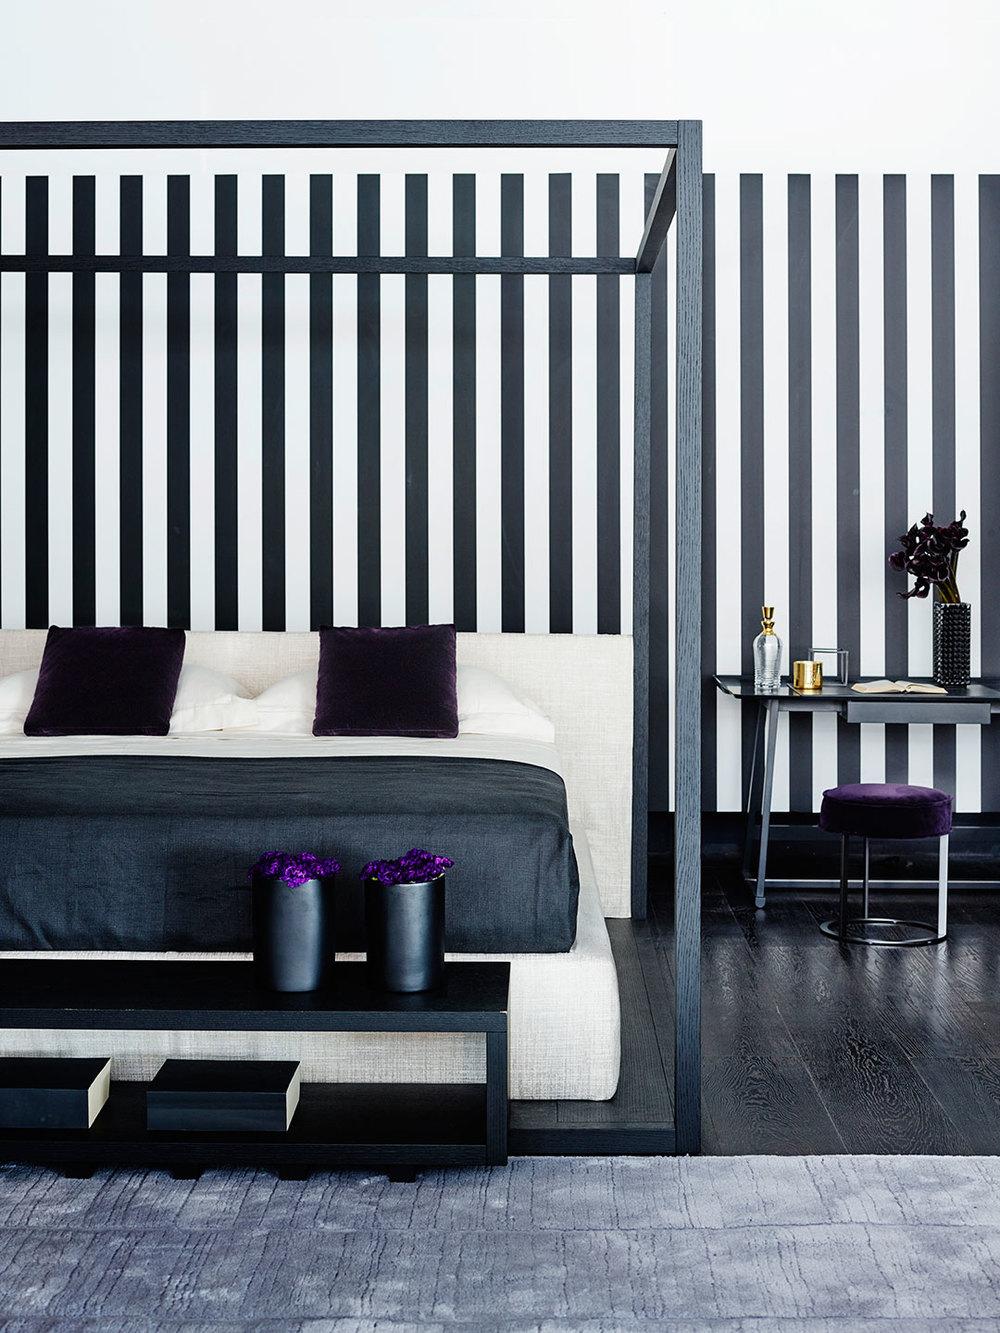 WEBSpace_Furniture_Steve_Cordony_150216_127848.jpg